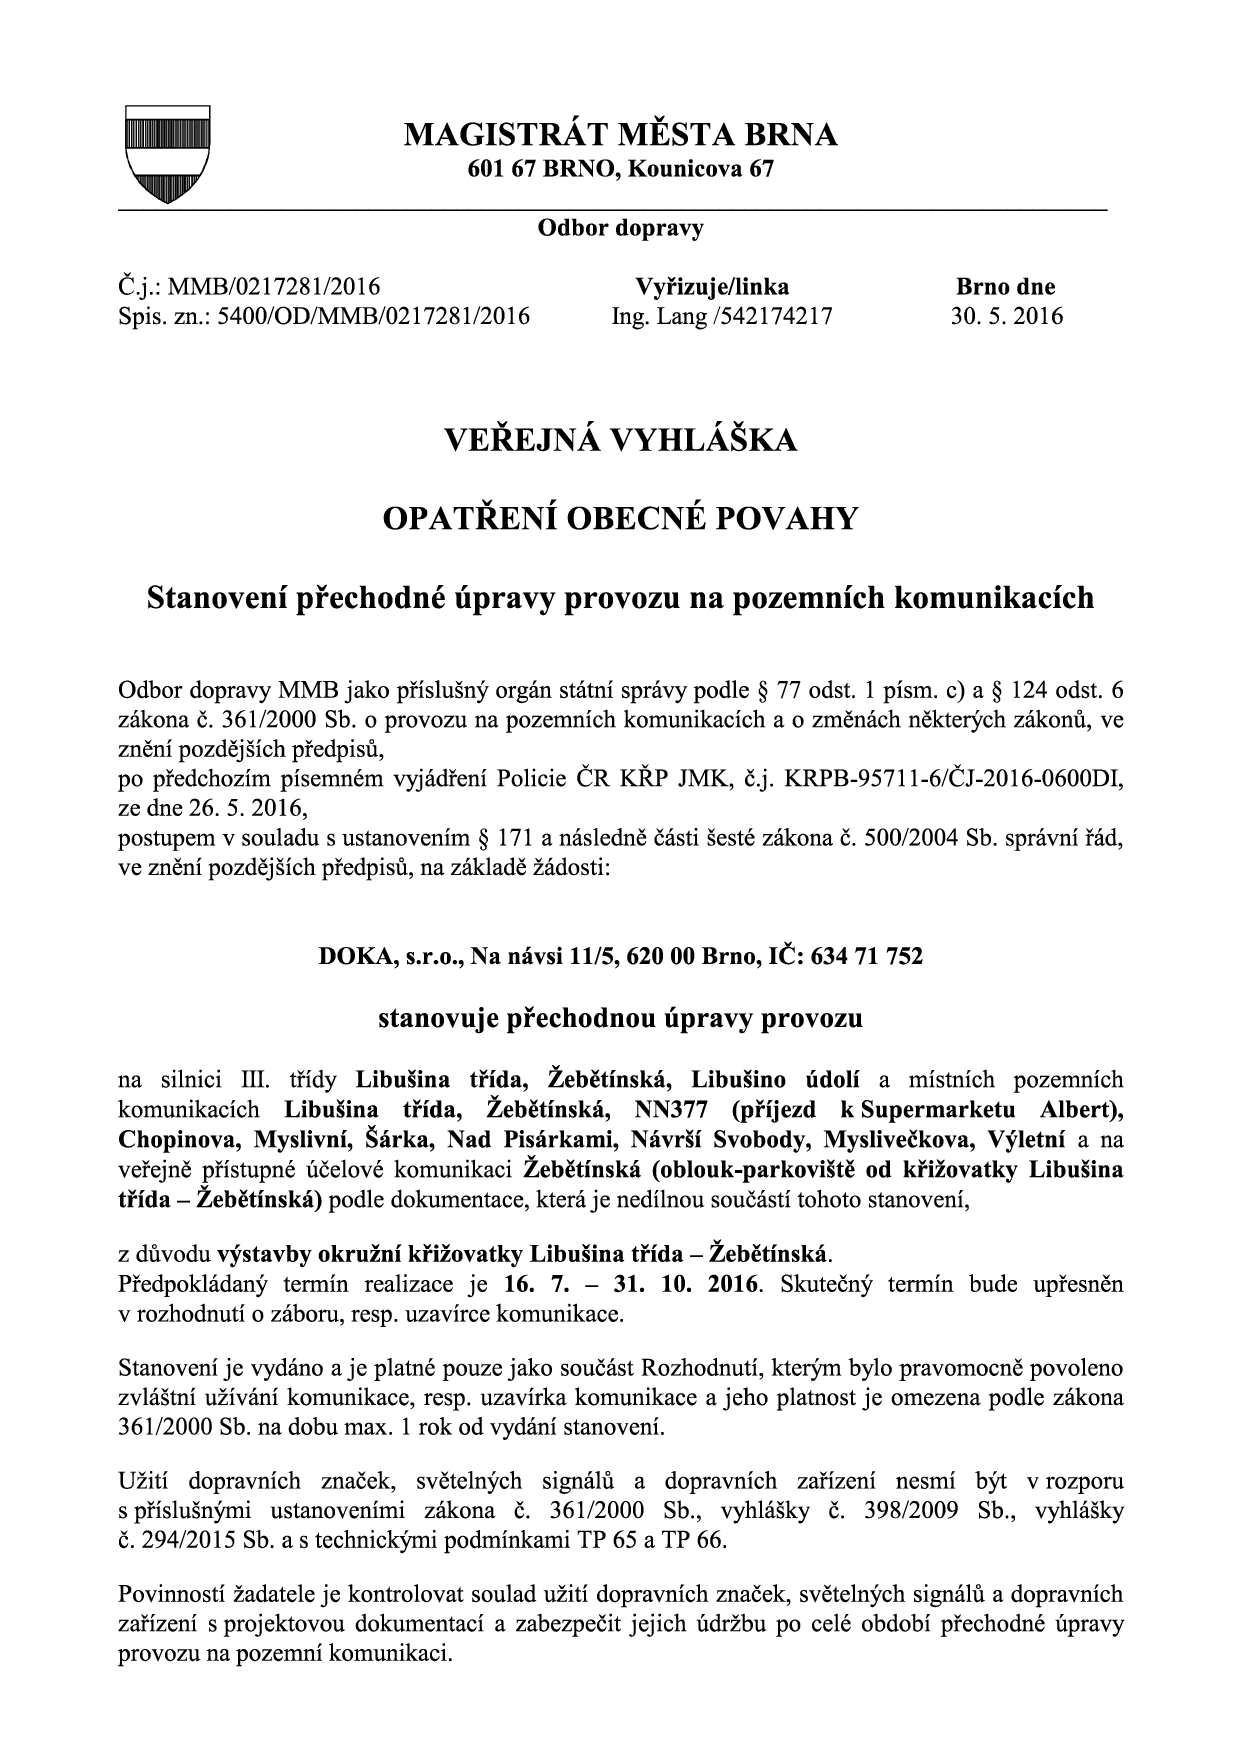 Veřejná vyhláška_DOKA_Libusina_trida_Zebetinska-oko-doprava-brno-kohouotovice-mojekohoutovice